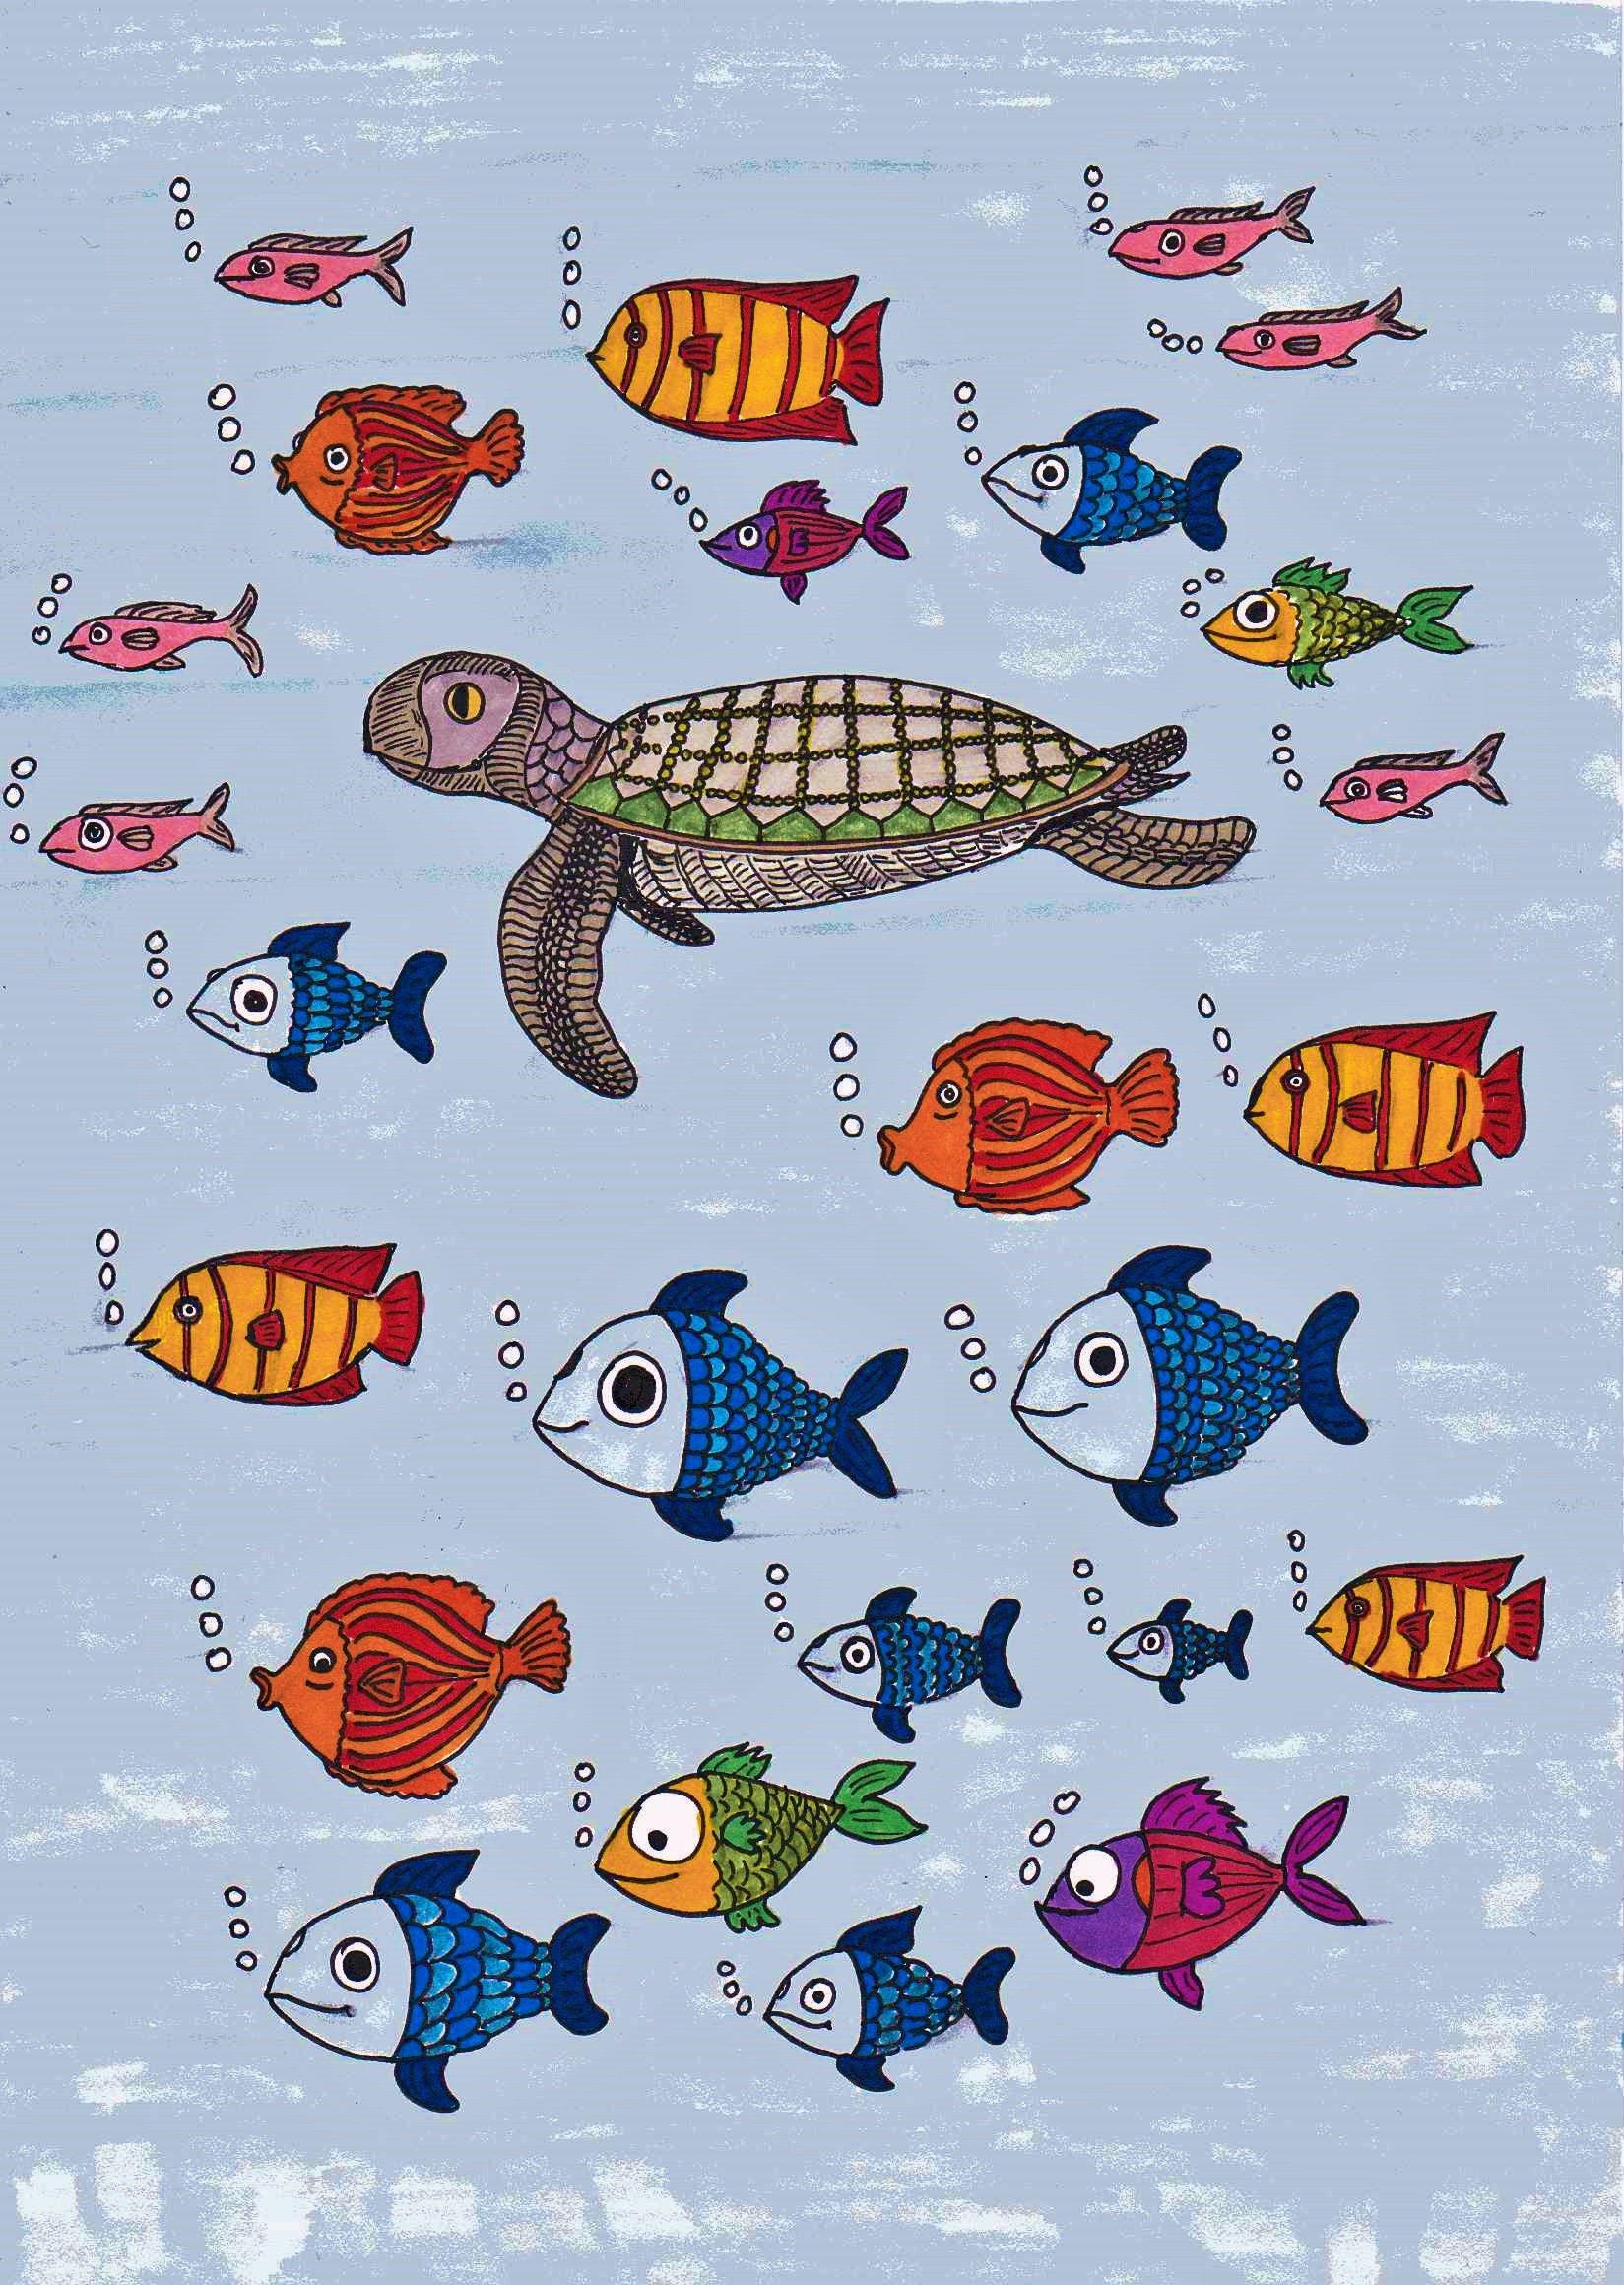 Turtle and Fish drawing illustration fish & marine